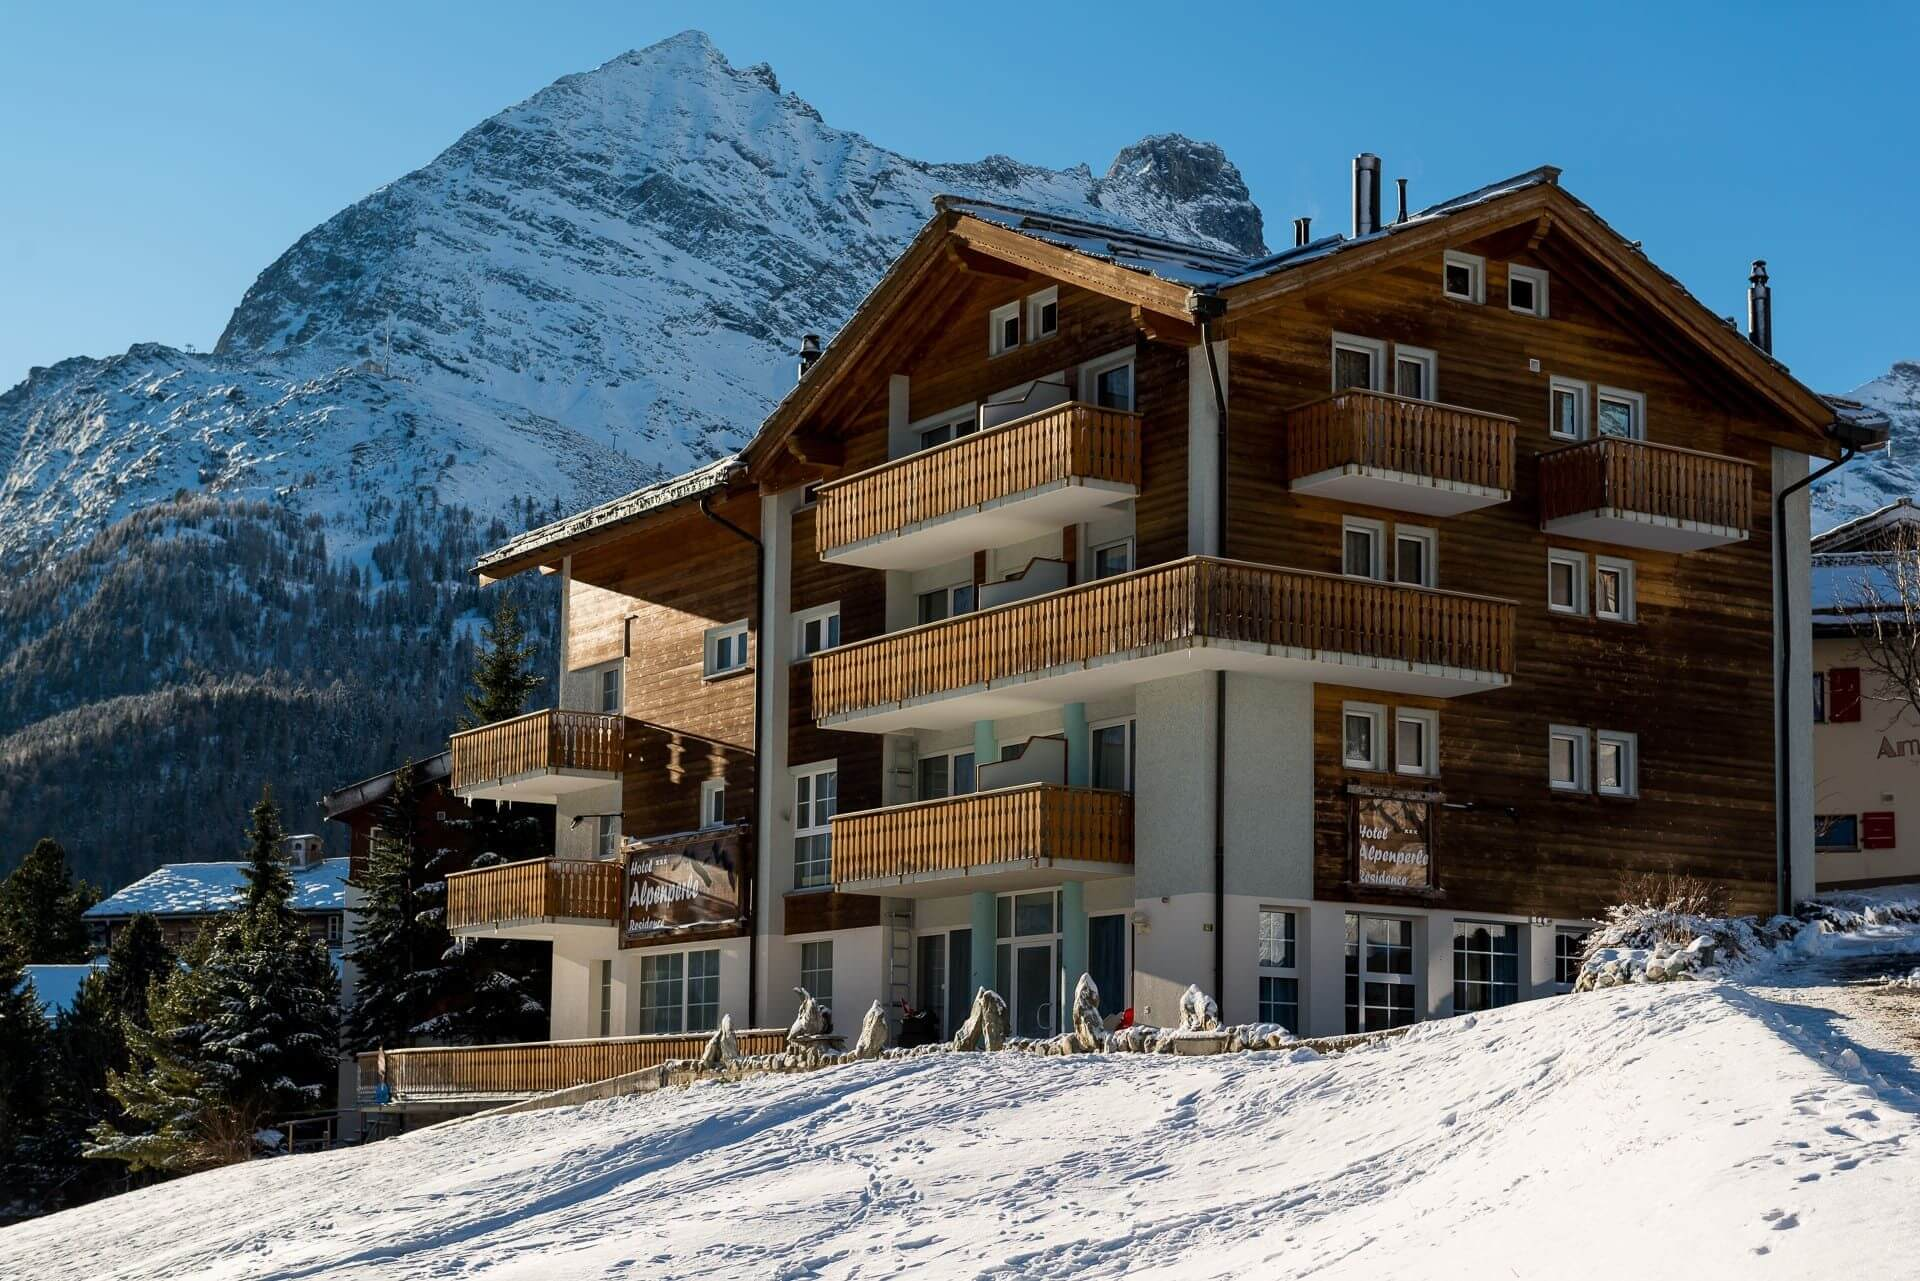 3-tage-im-hotel-alpenperle-in-saas-fee